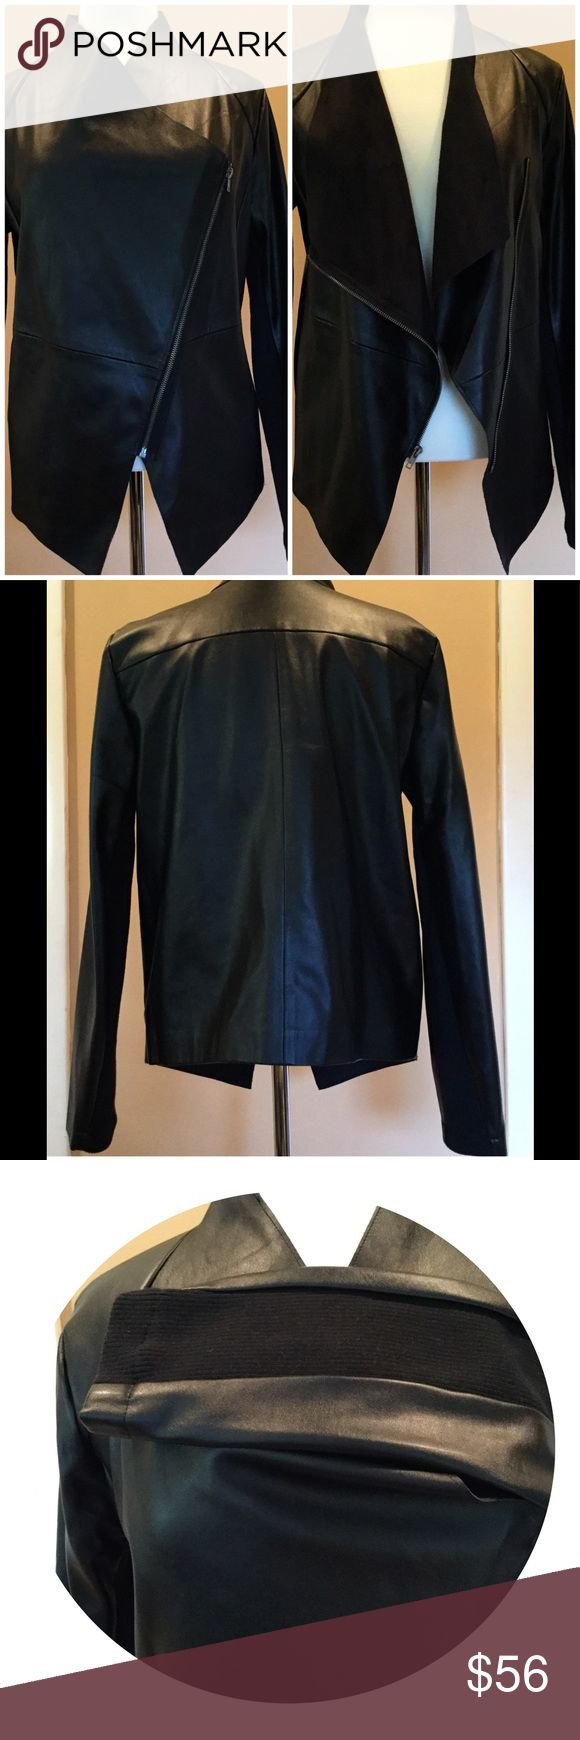 "BB Dakota Vegan Leather Drape jacket gently used; Foxy jacket looking for new home. Armpits 21"", length 27"", arms 26"". BB Dakota Jackets & Coats"